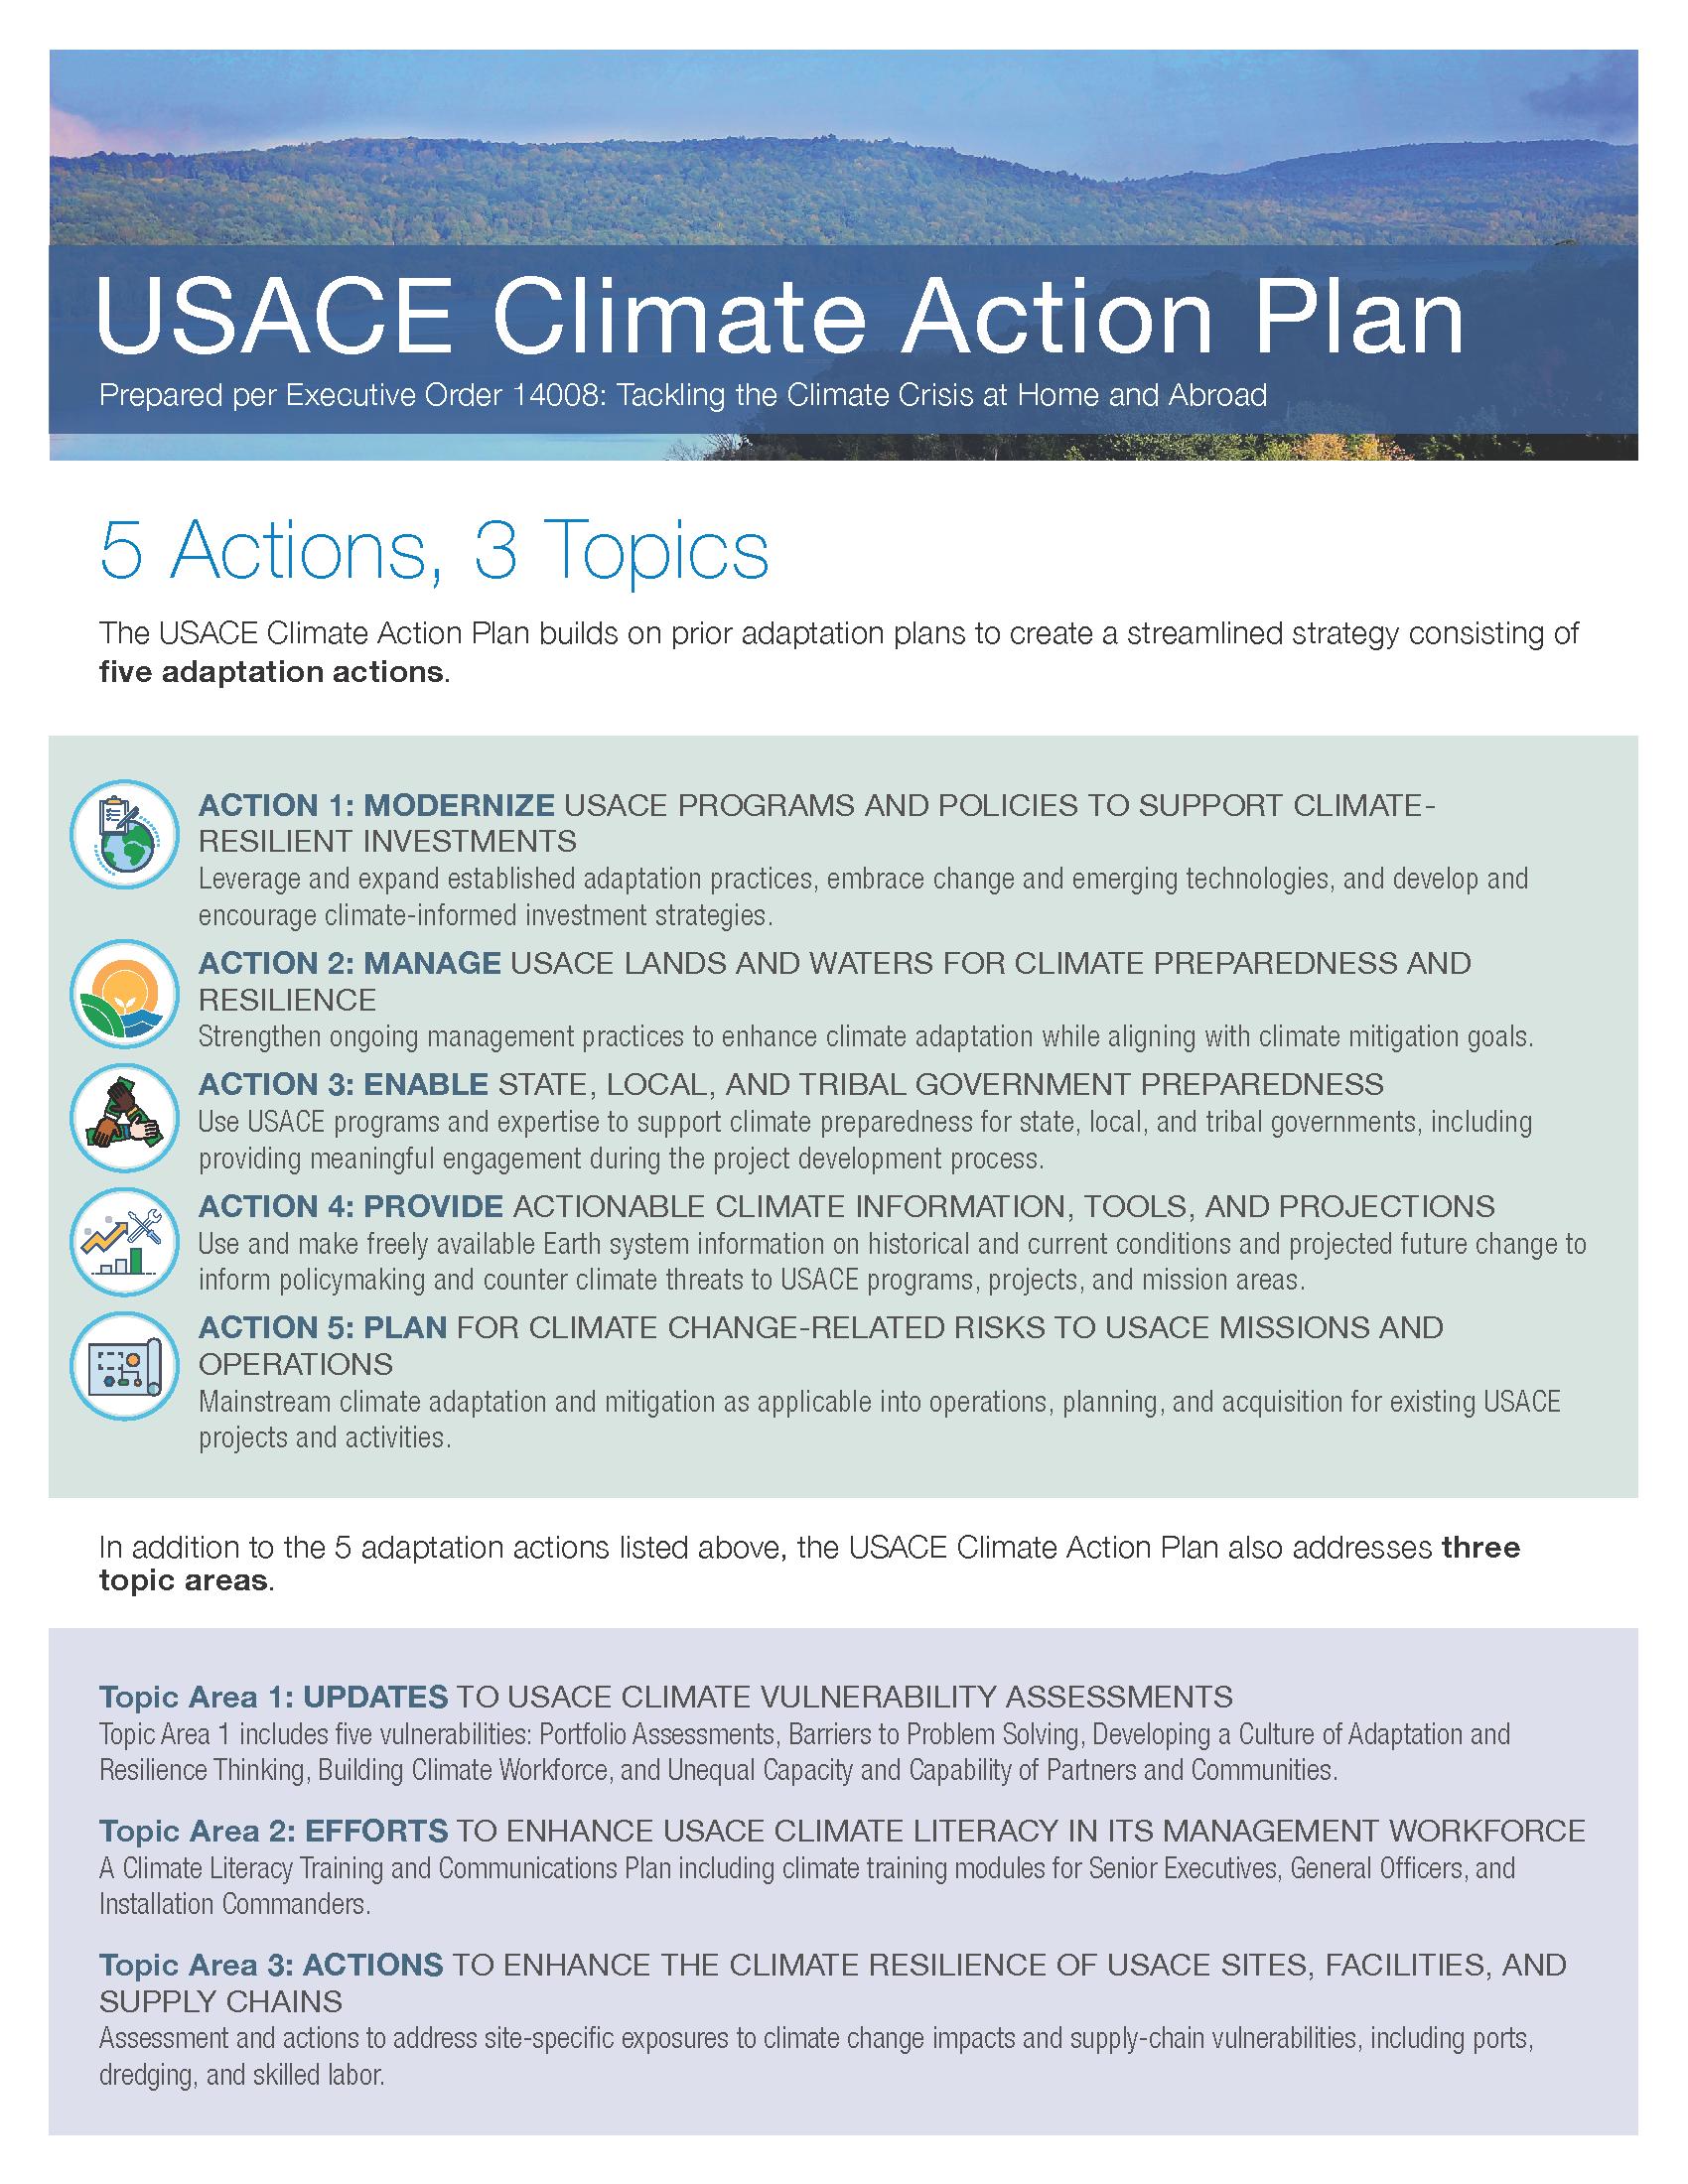 Climate Action Plan Fact Sheet